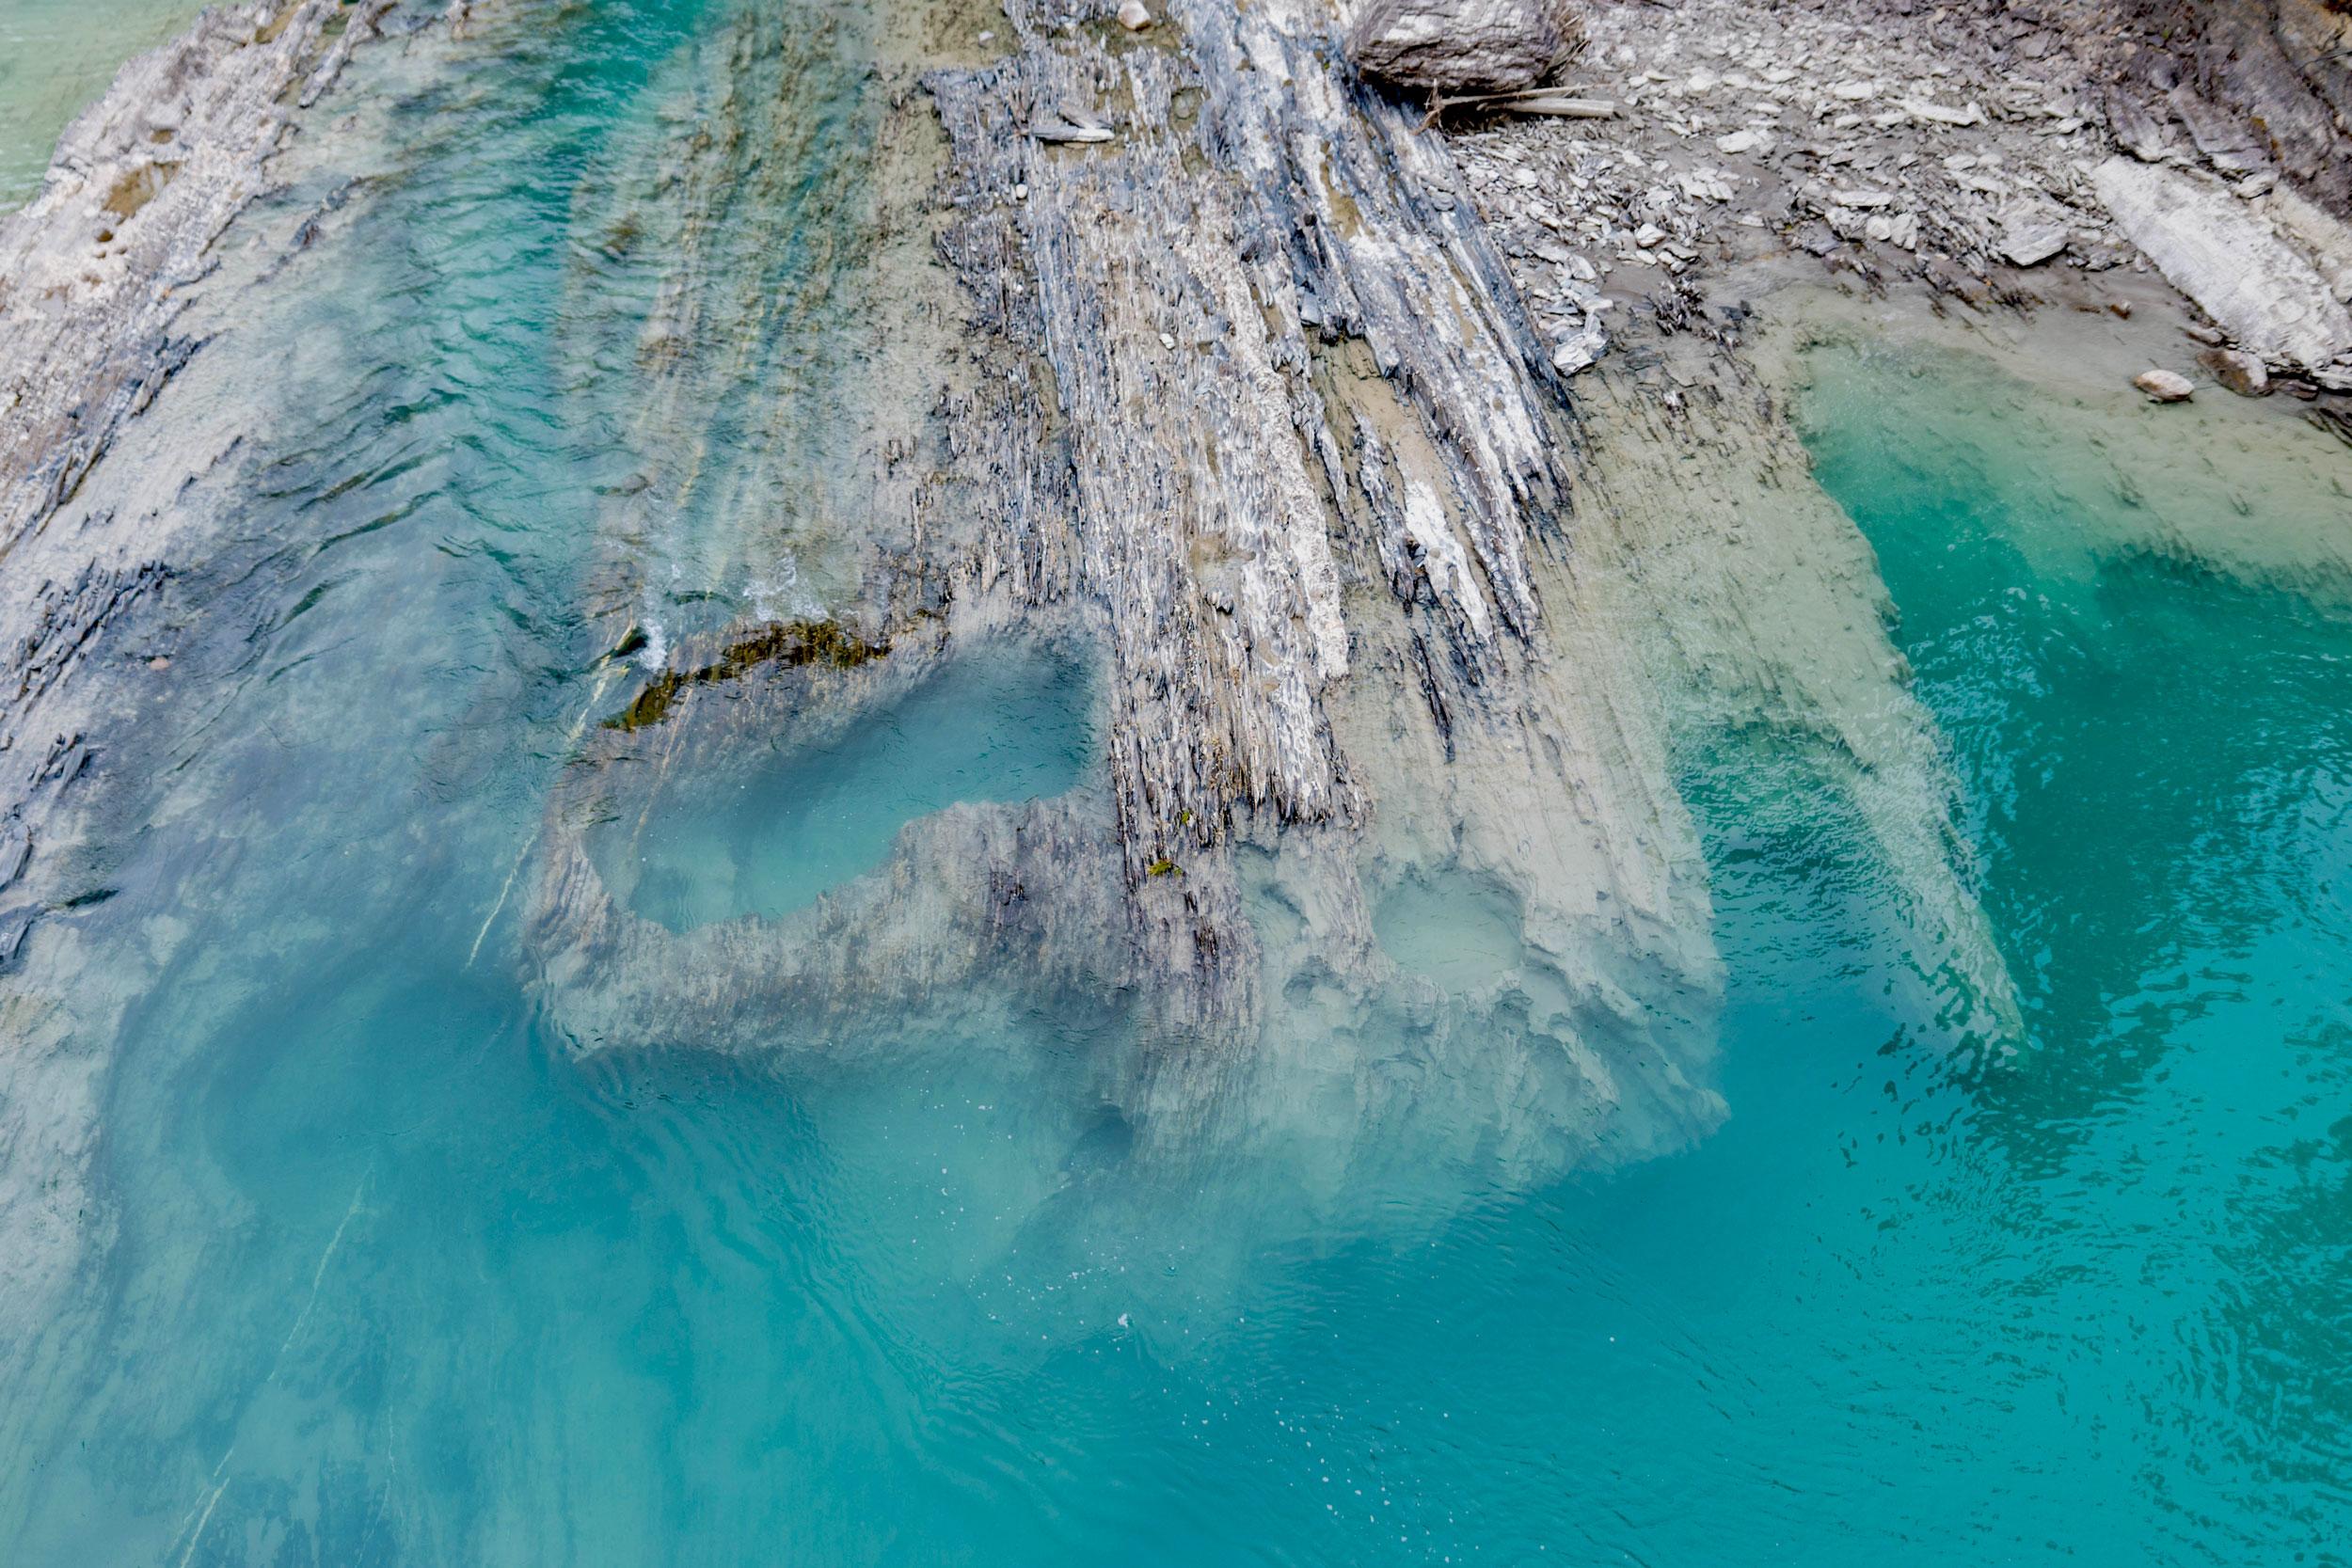 Blue waters at Kicking Horse Pass